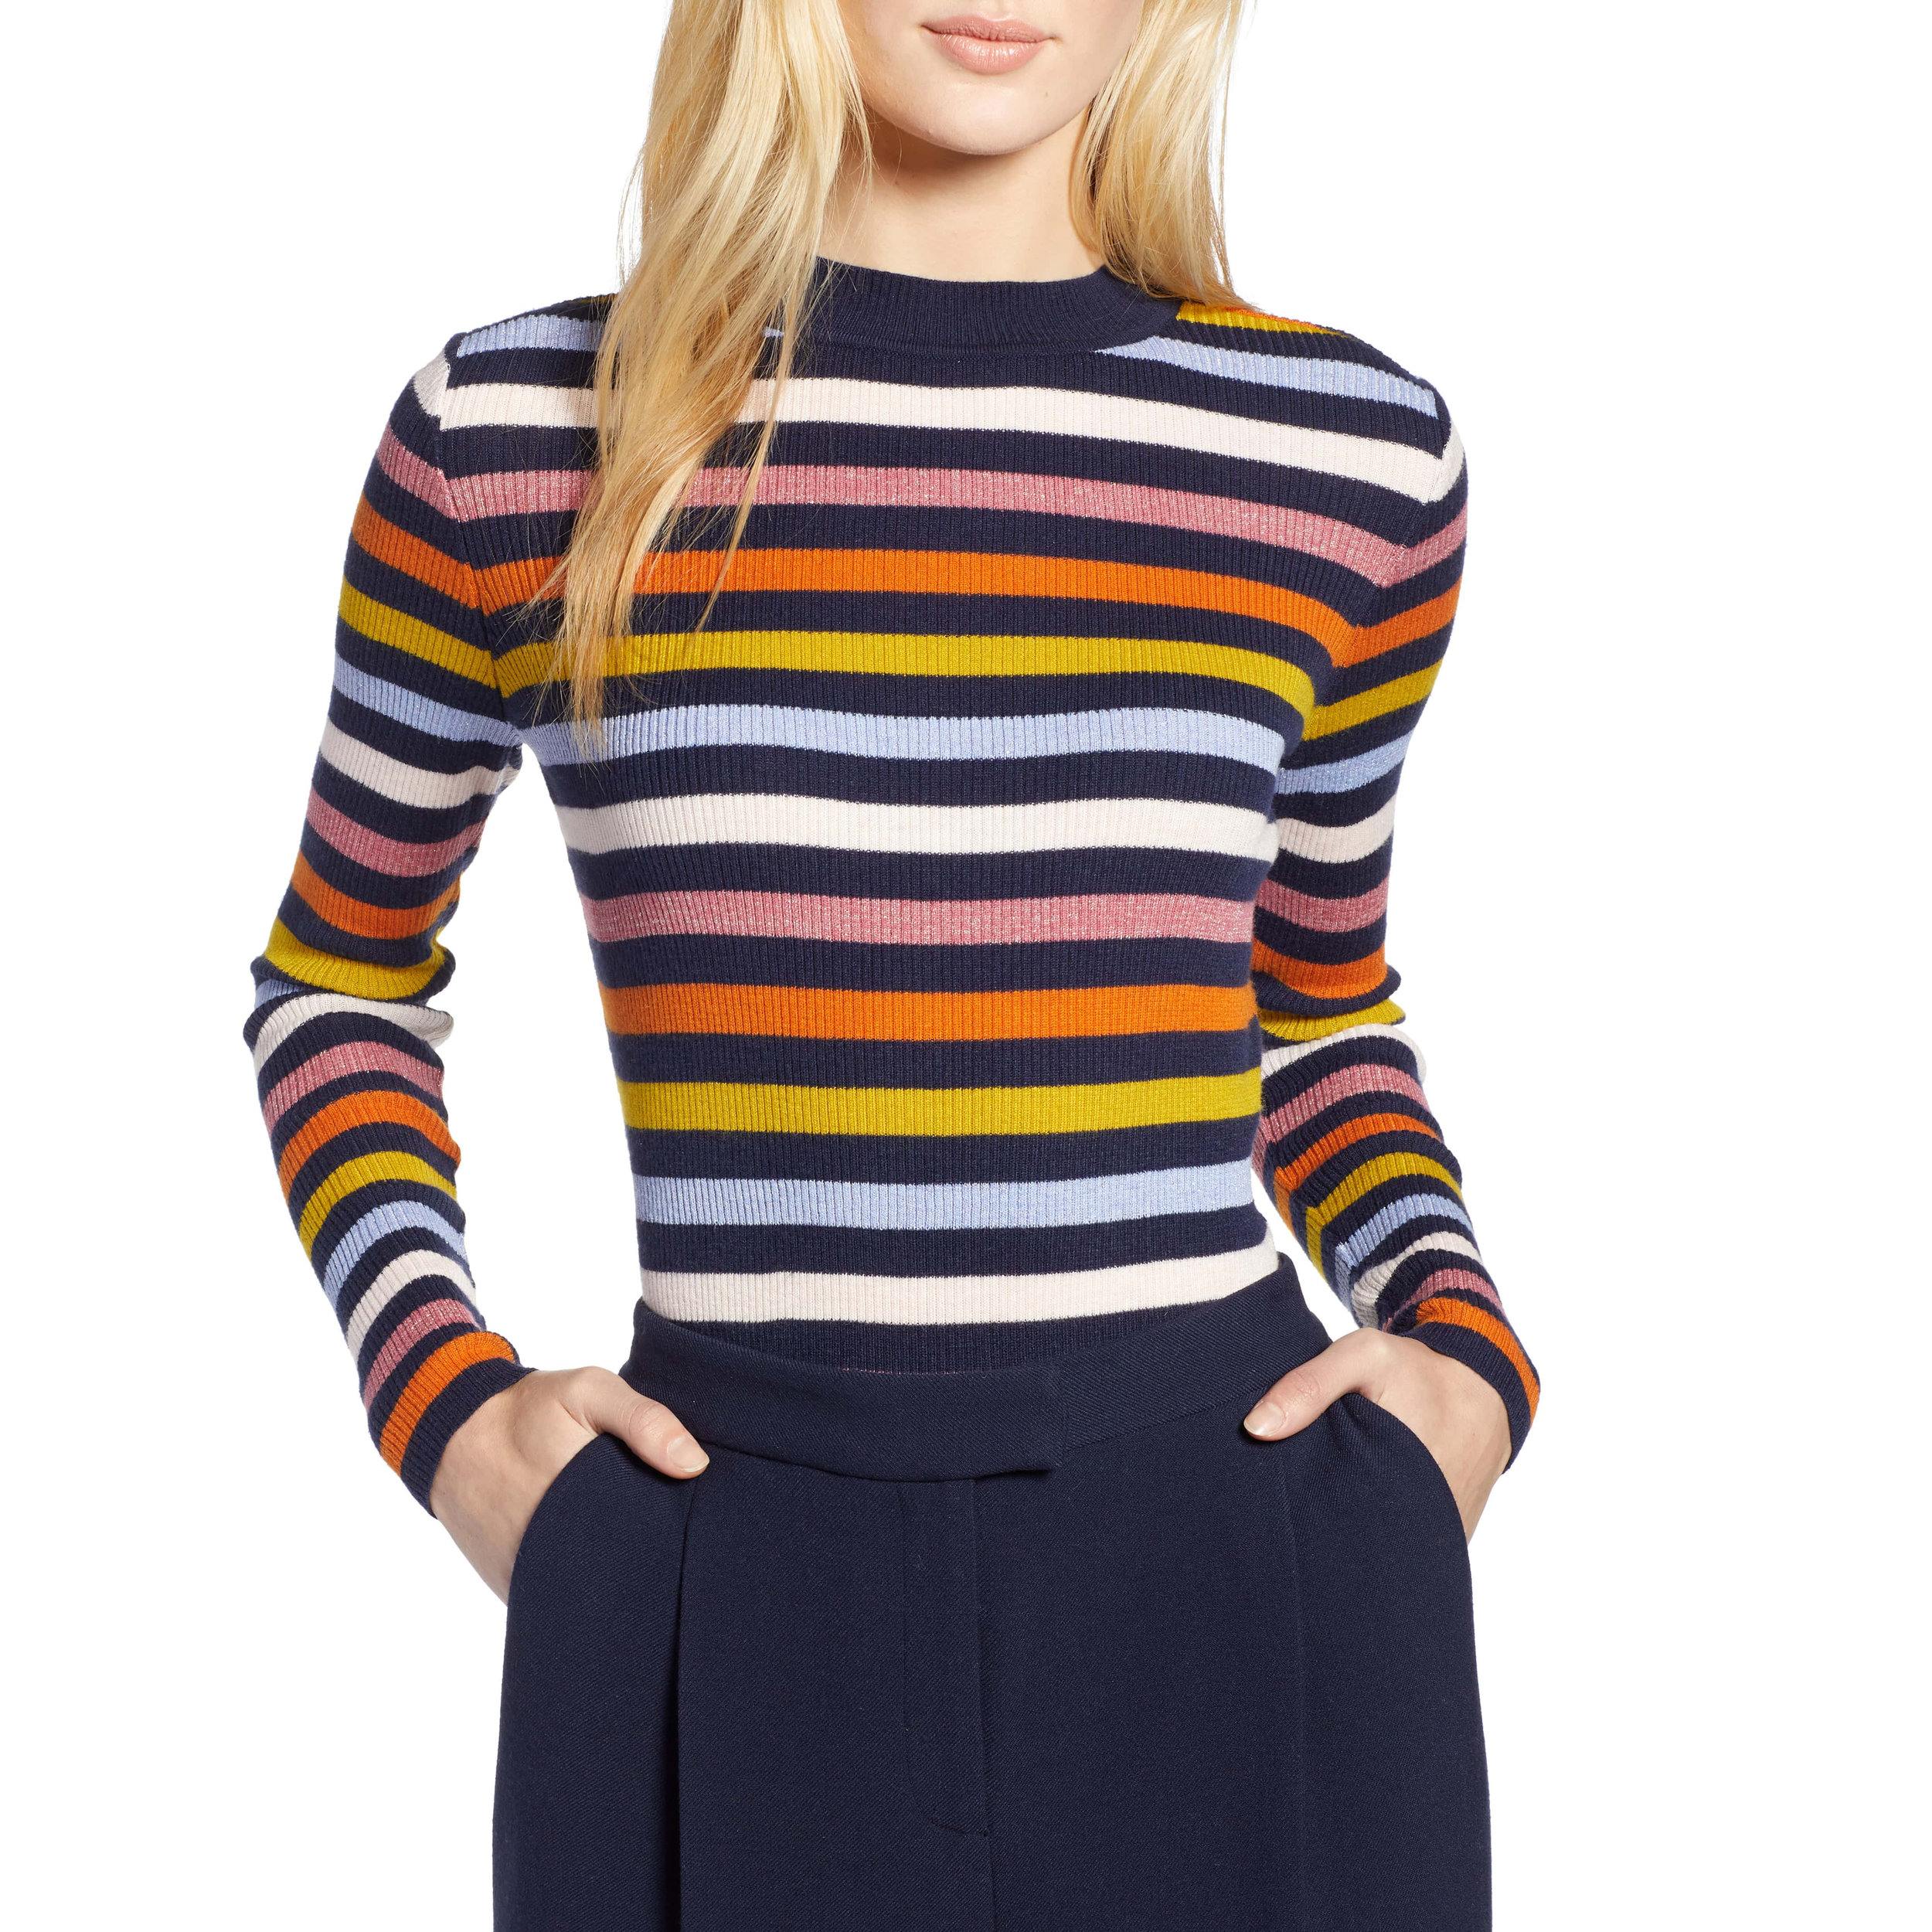 Halogen x Atlantic-Pacific Shimmer Stripe Sweater, Nordstrom, $59 -